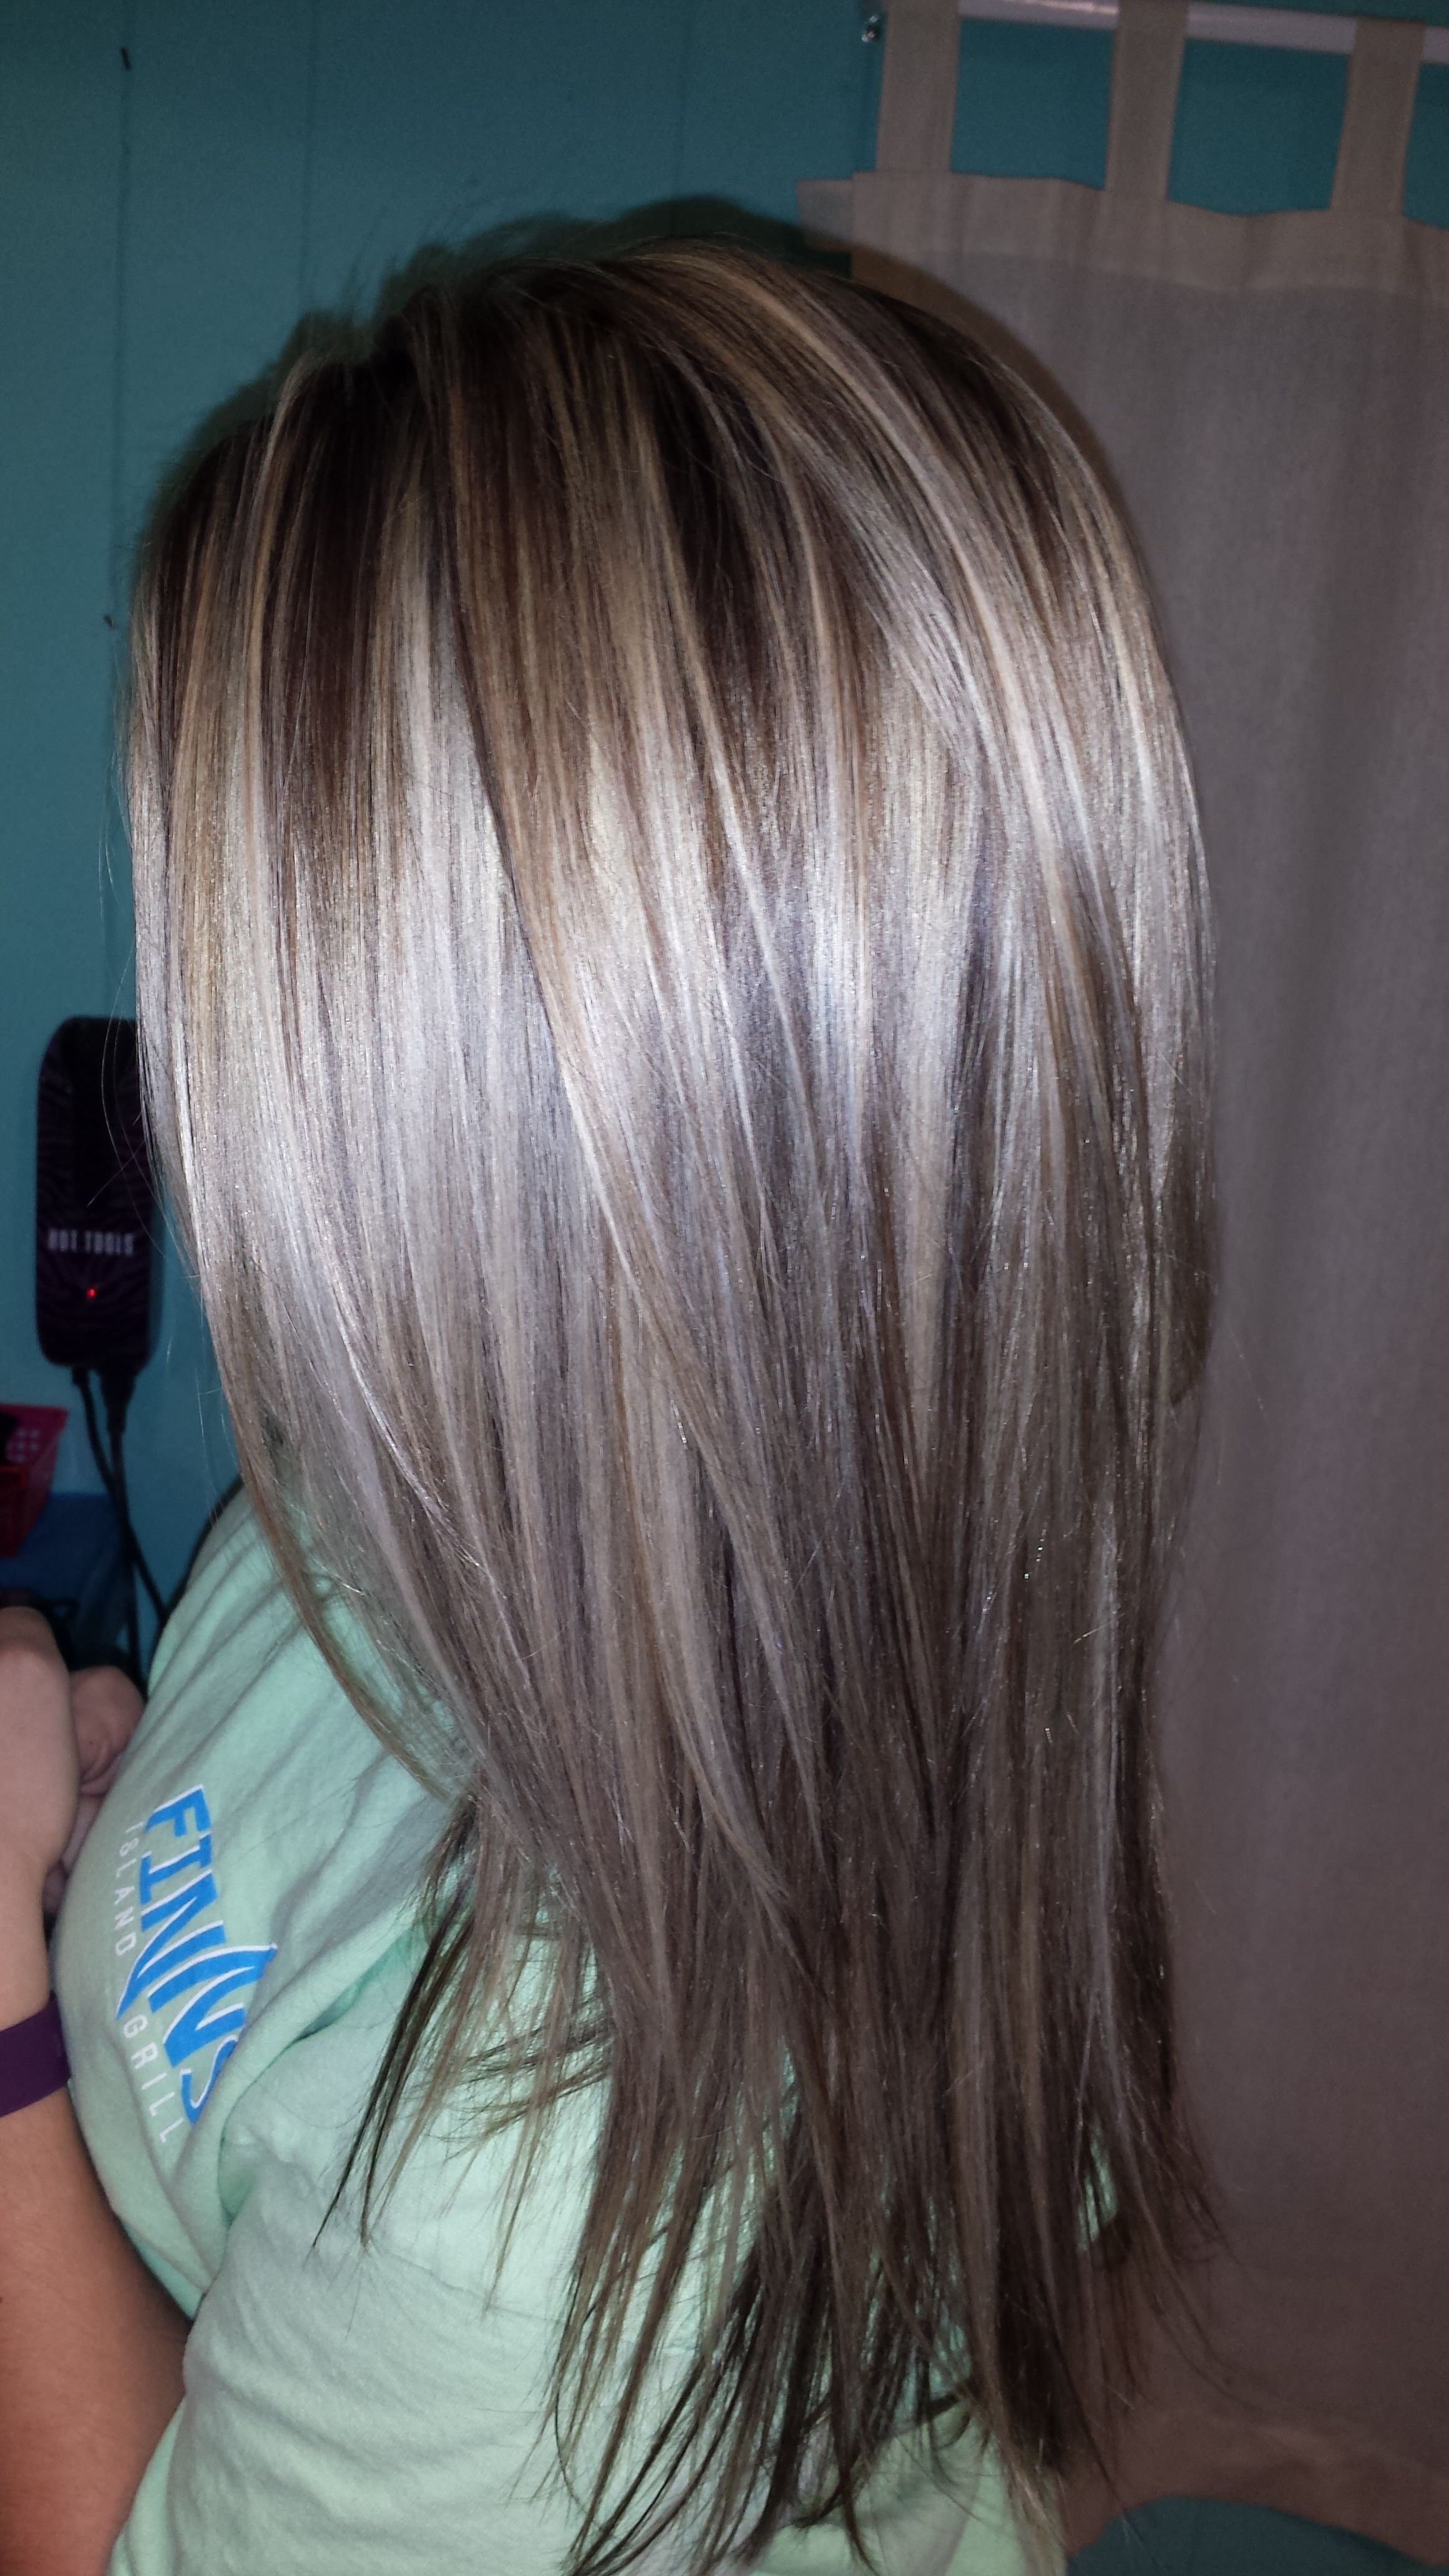 Dark Brown Hair With Silver Highlights Google Search Mykinglist Com Brown Hair With Silver Highlights Brown Hair With Blonde Highlights Light Brown Hair